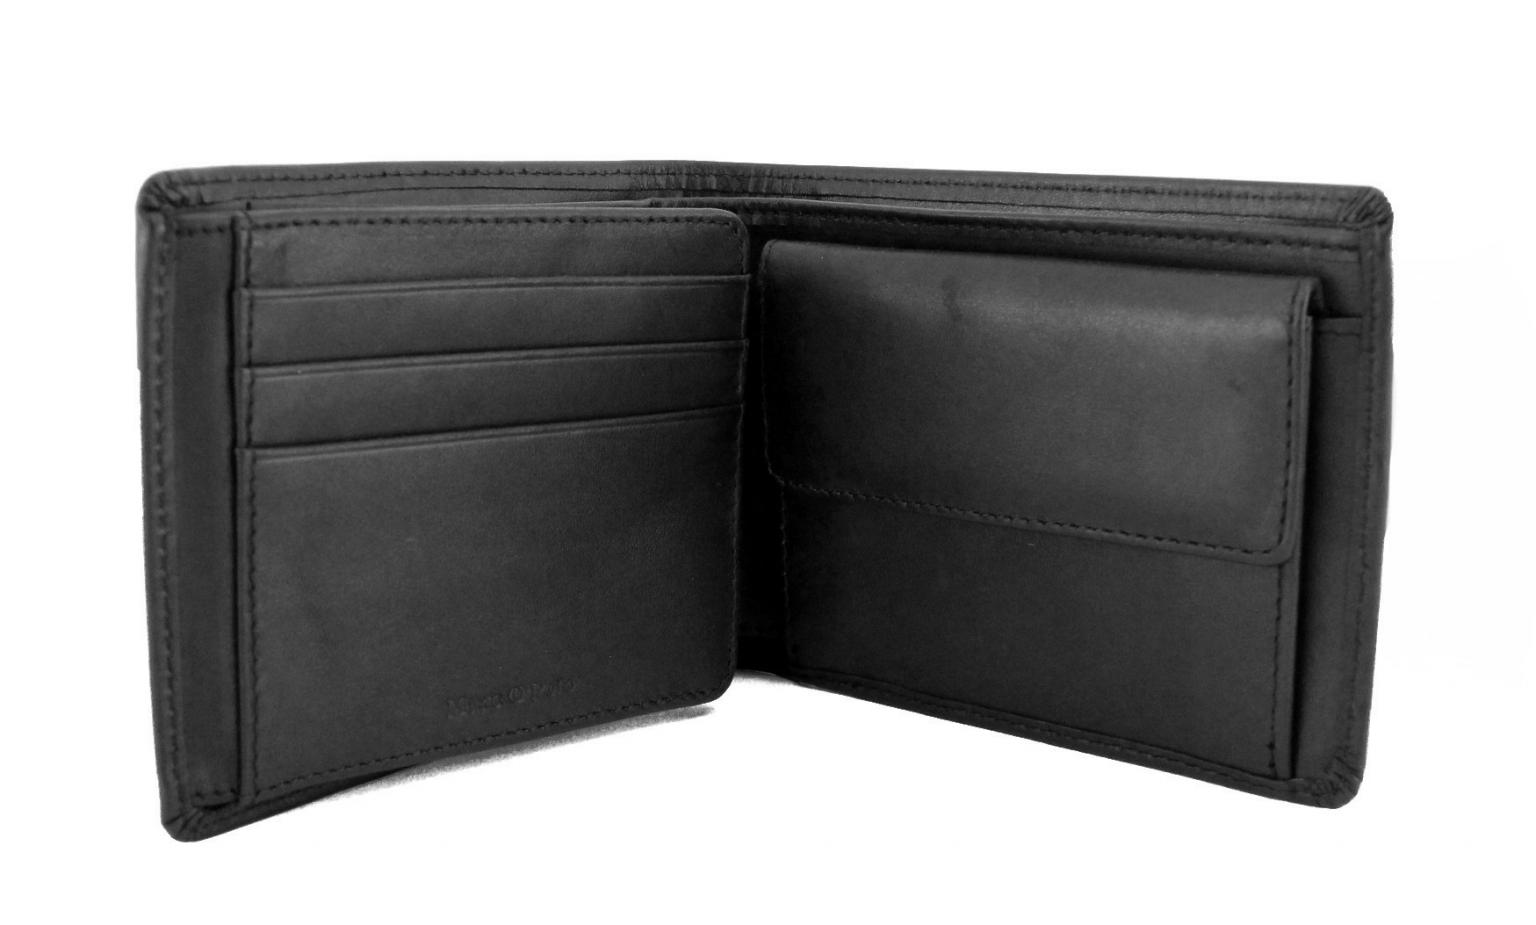 75a21feec0ea2 Marc`O Polo Herren Portmonee Querformat Leder Grau - Bags   more